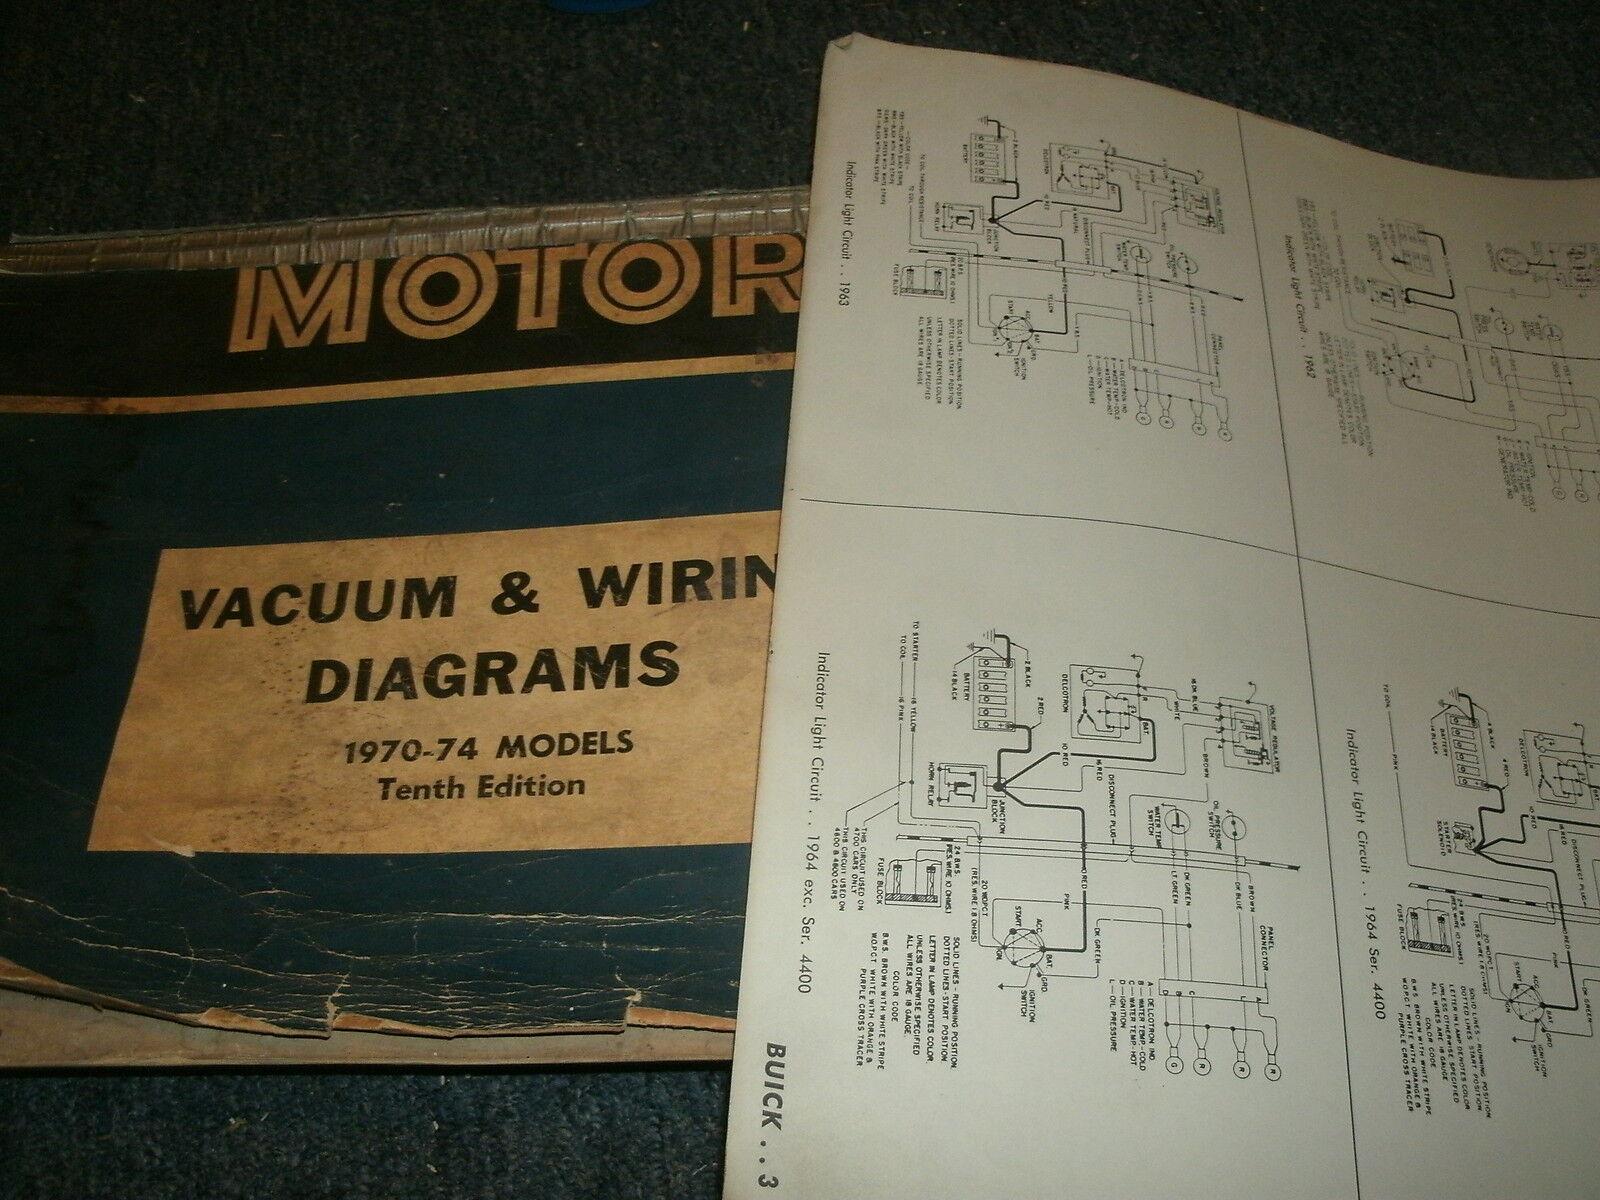 1974 FORD MUSTANG II WIRING VACUUM DIAGRAMS SCHEMATICS MANUAL SHEETS SET |  eBayeBay